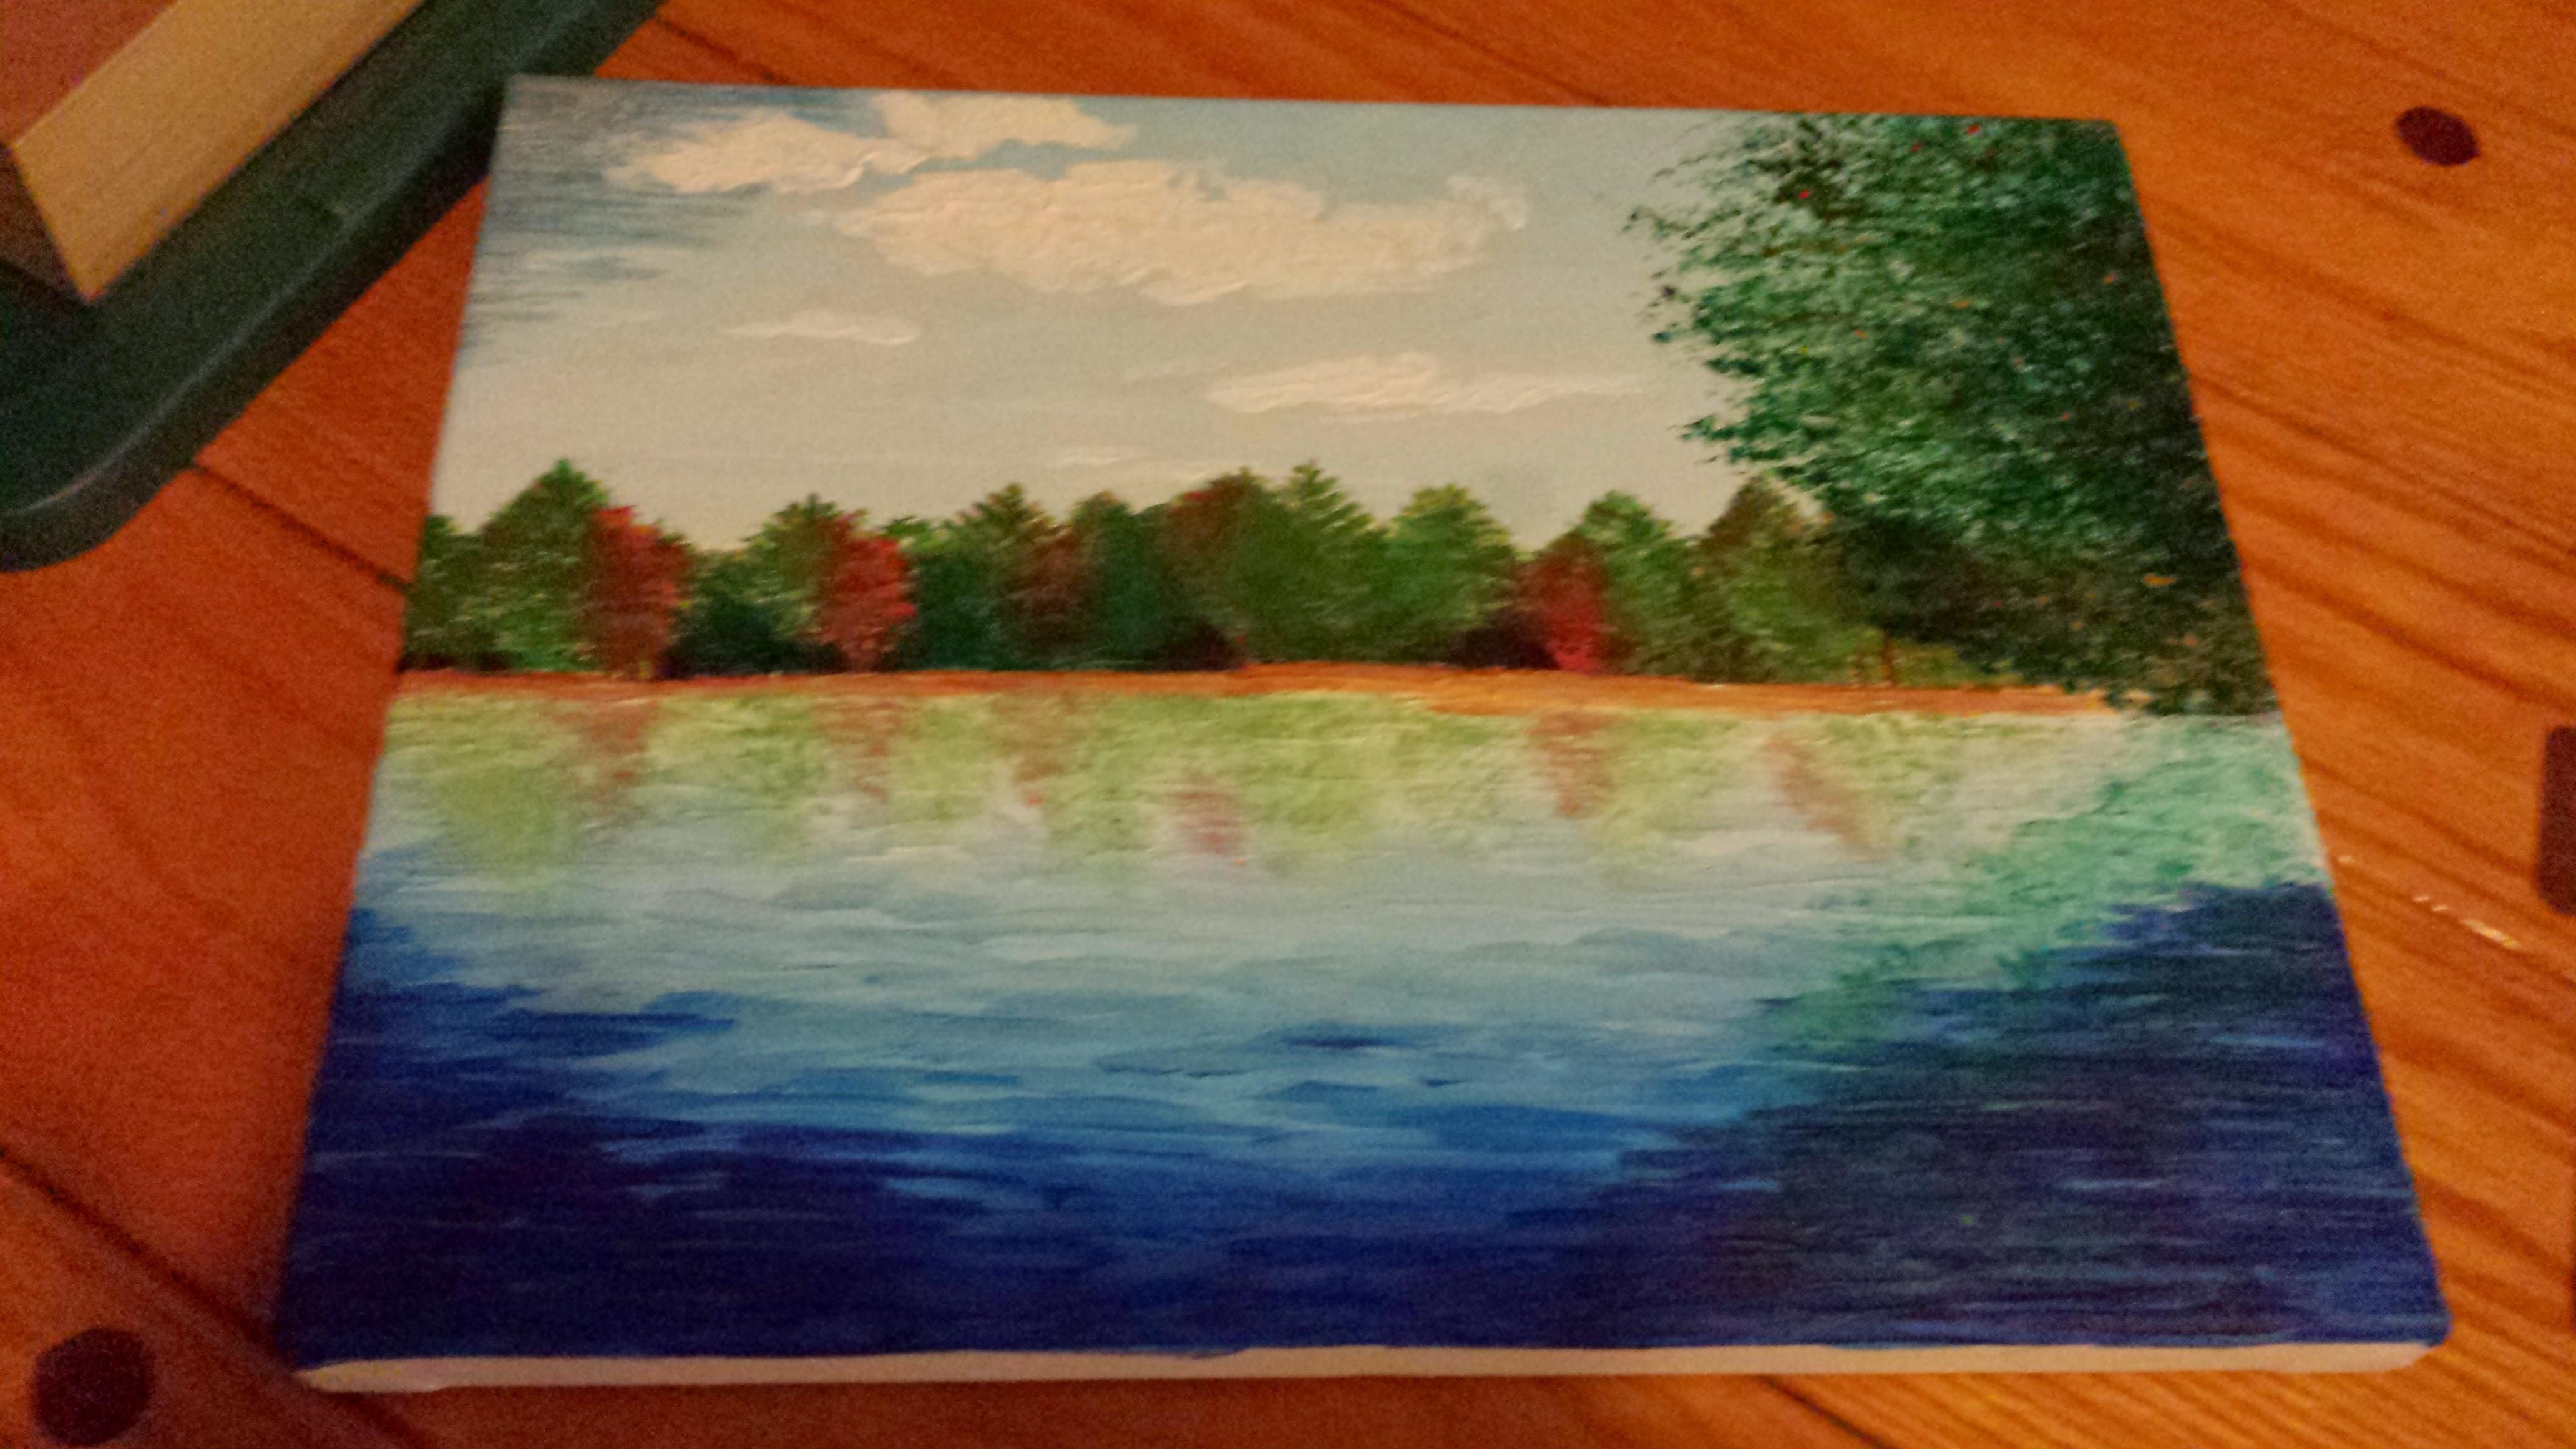 My Story Lake I (2015)